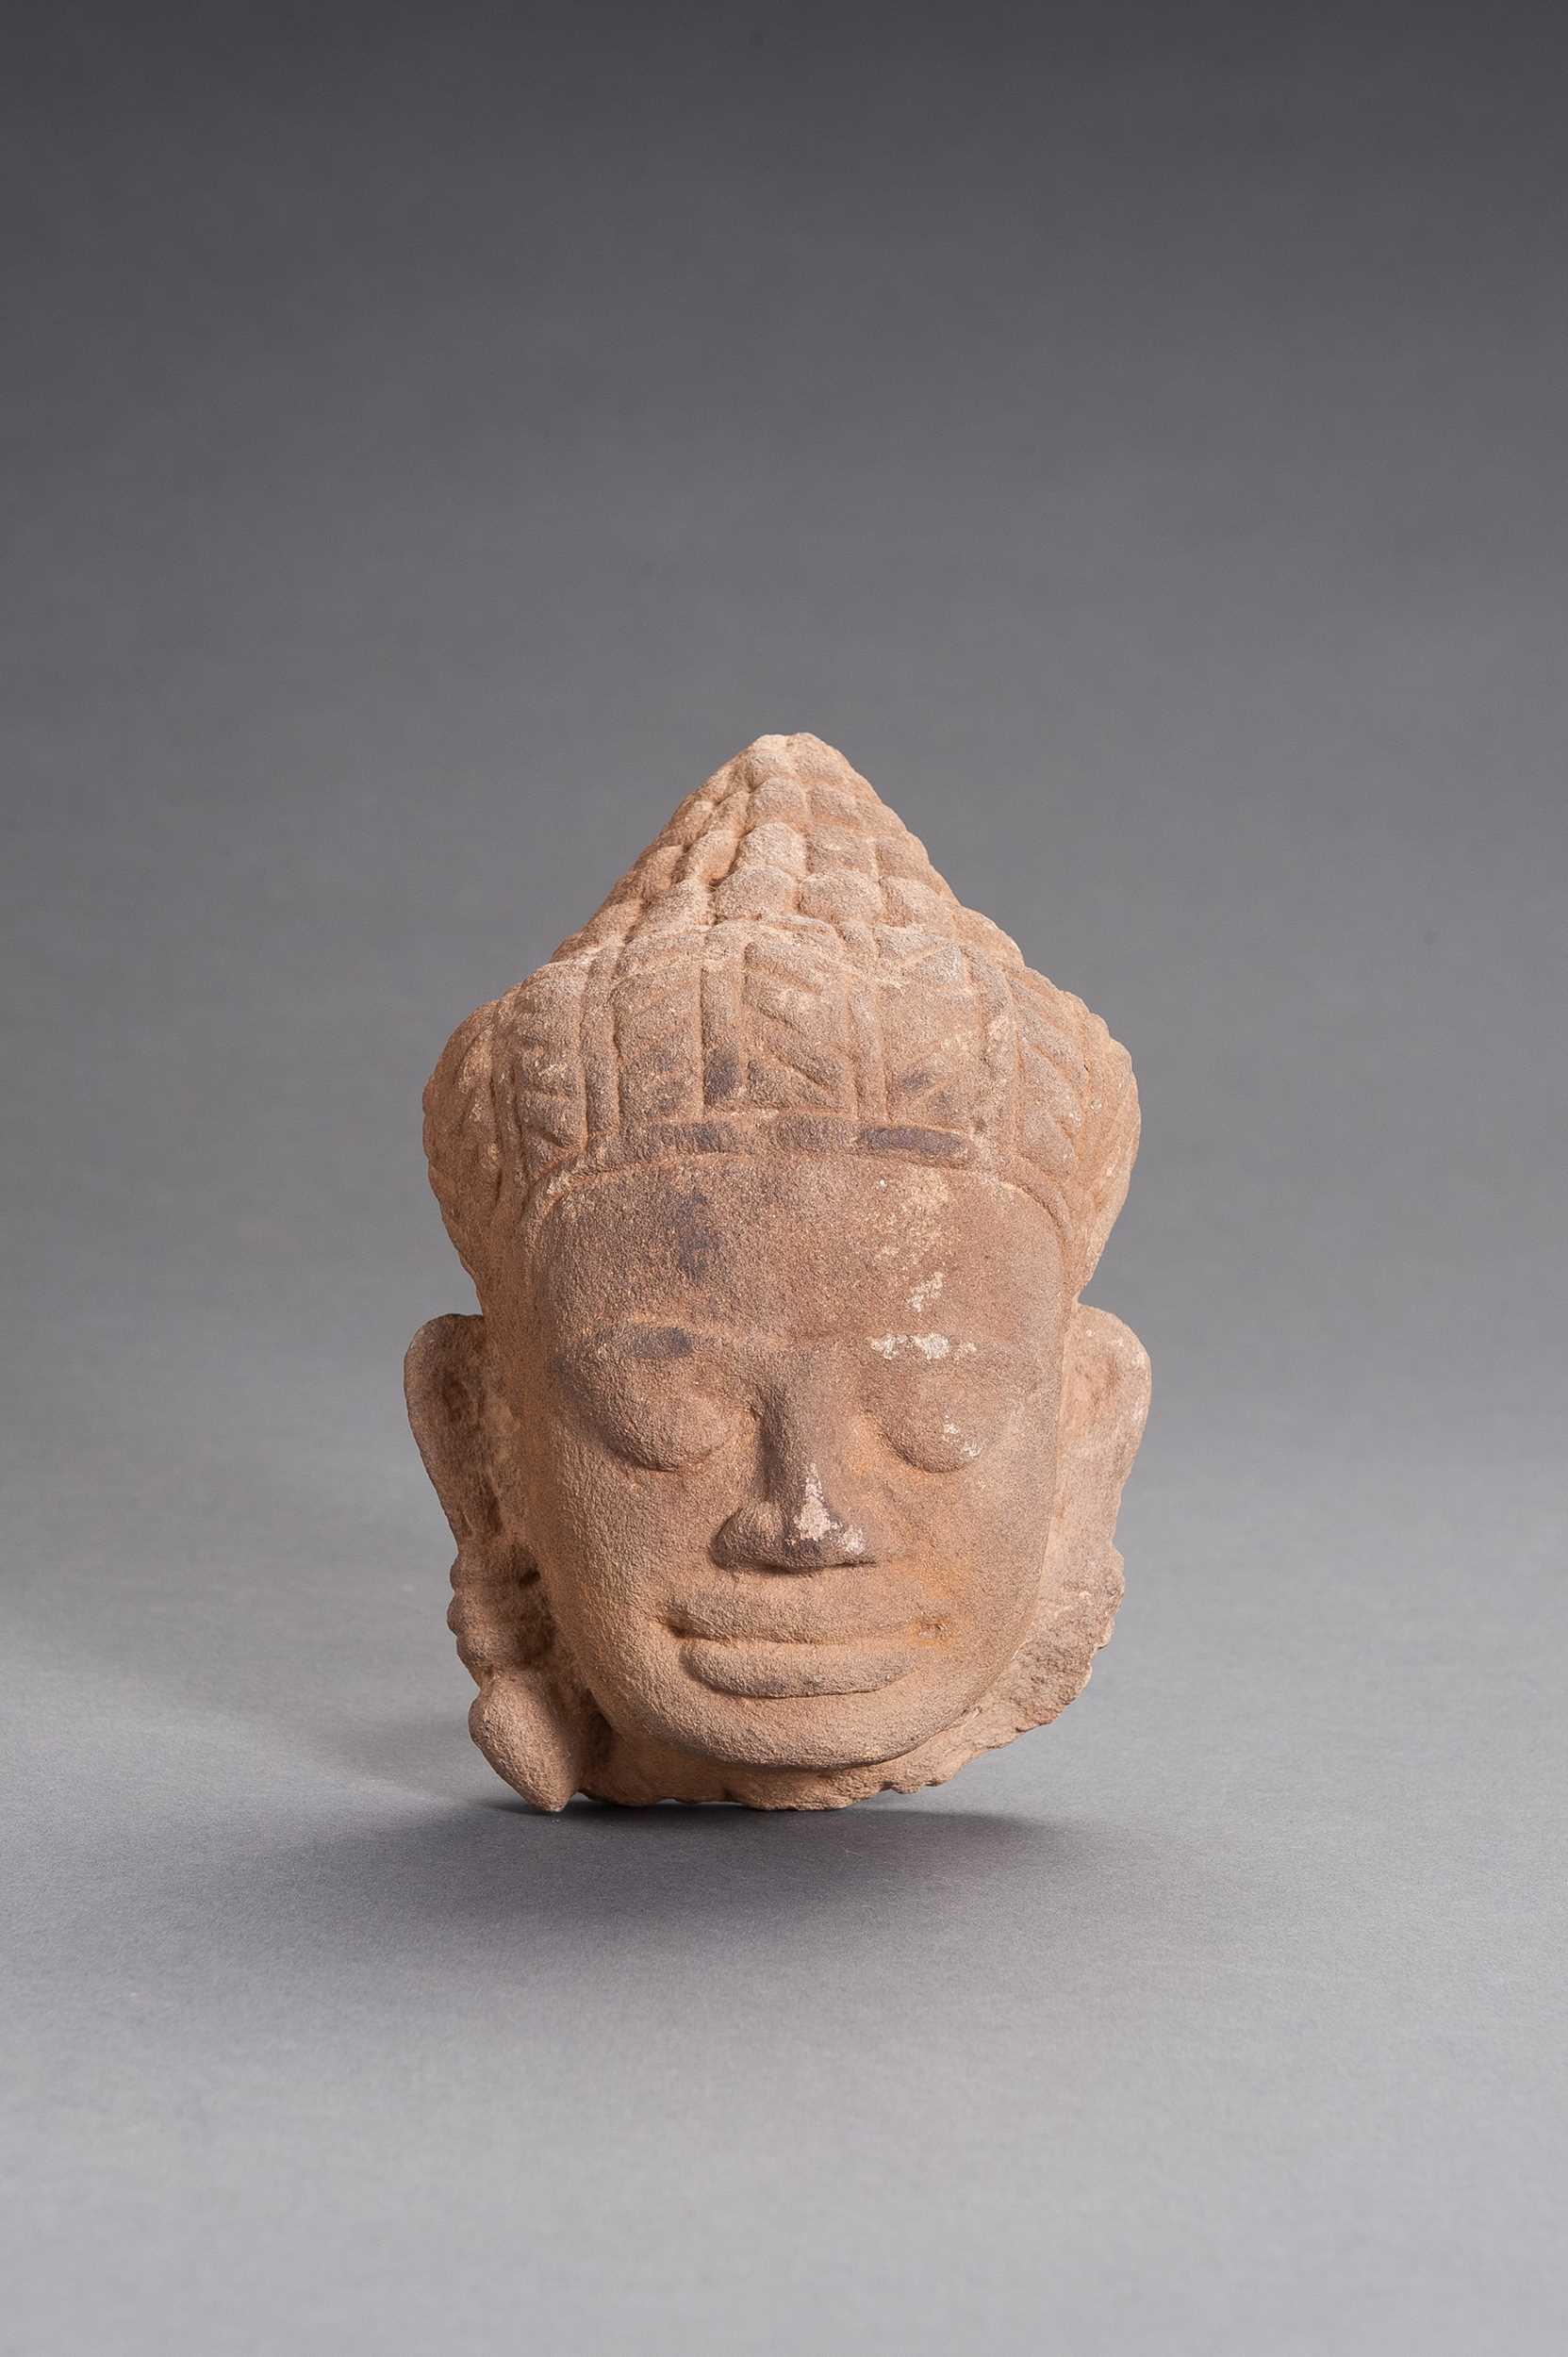 A KHMER SANDSTONE HEAD OF BUDDHA